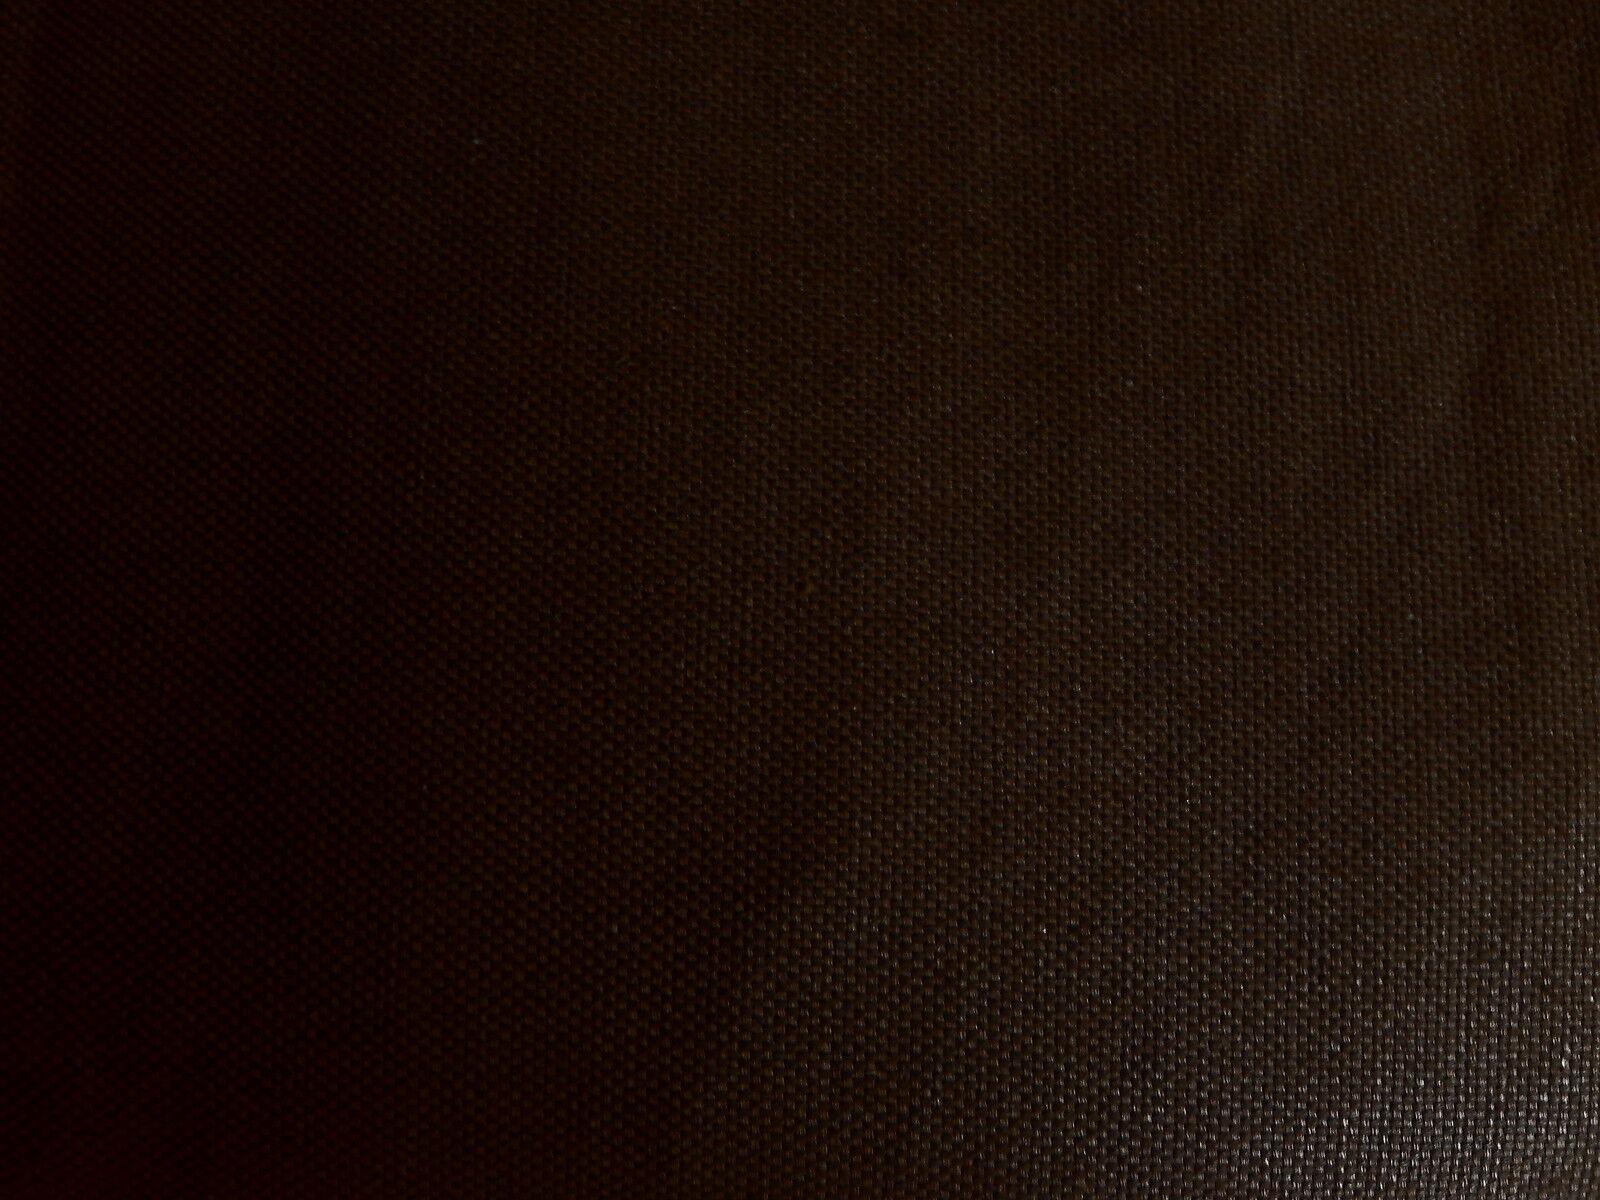 Clearance Pottery Barn Peyton Grommet Drape Panels (2) (2) (2) Chocolate 84  9b7a2a